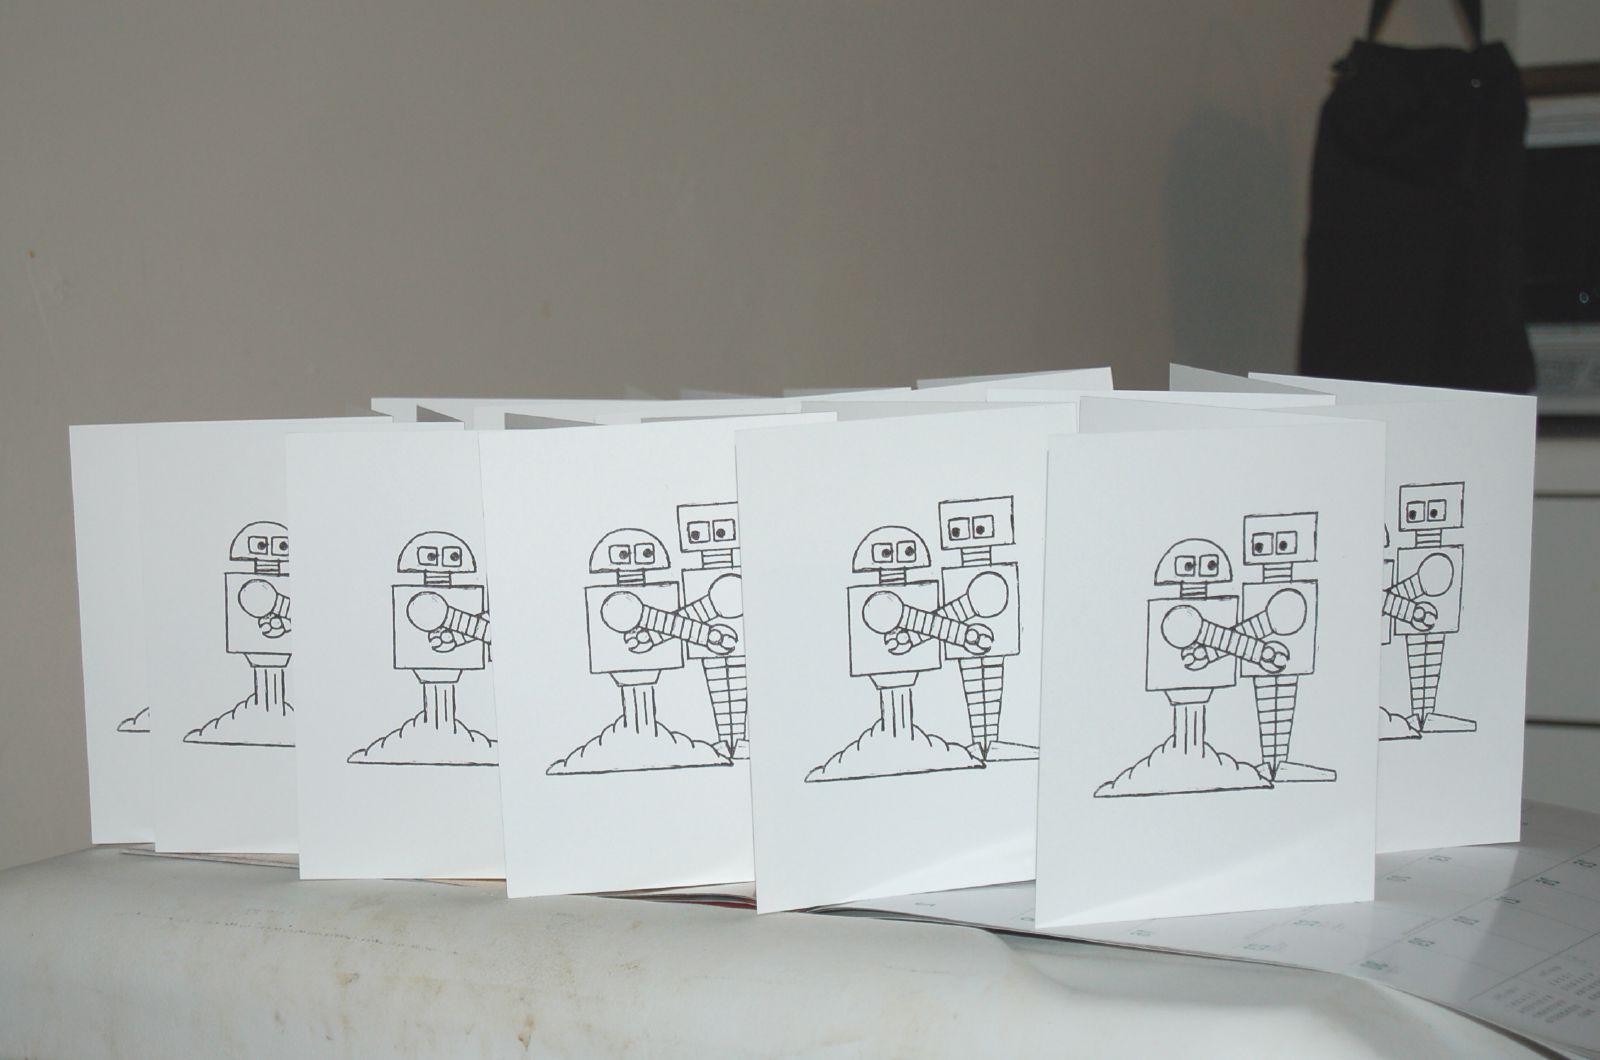 A few nice wedding invitation images I found: